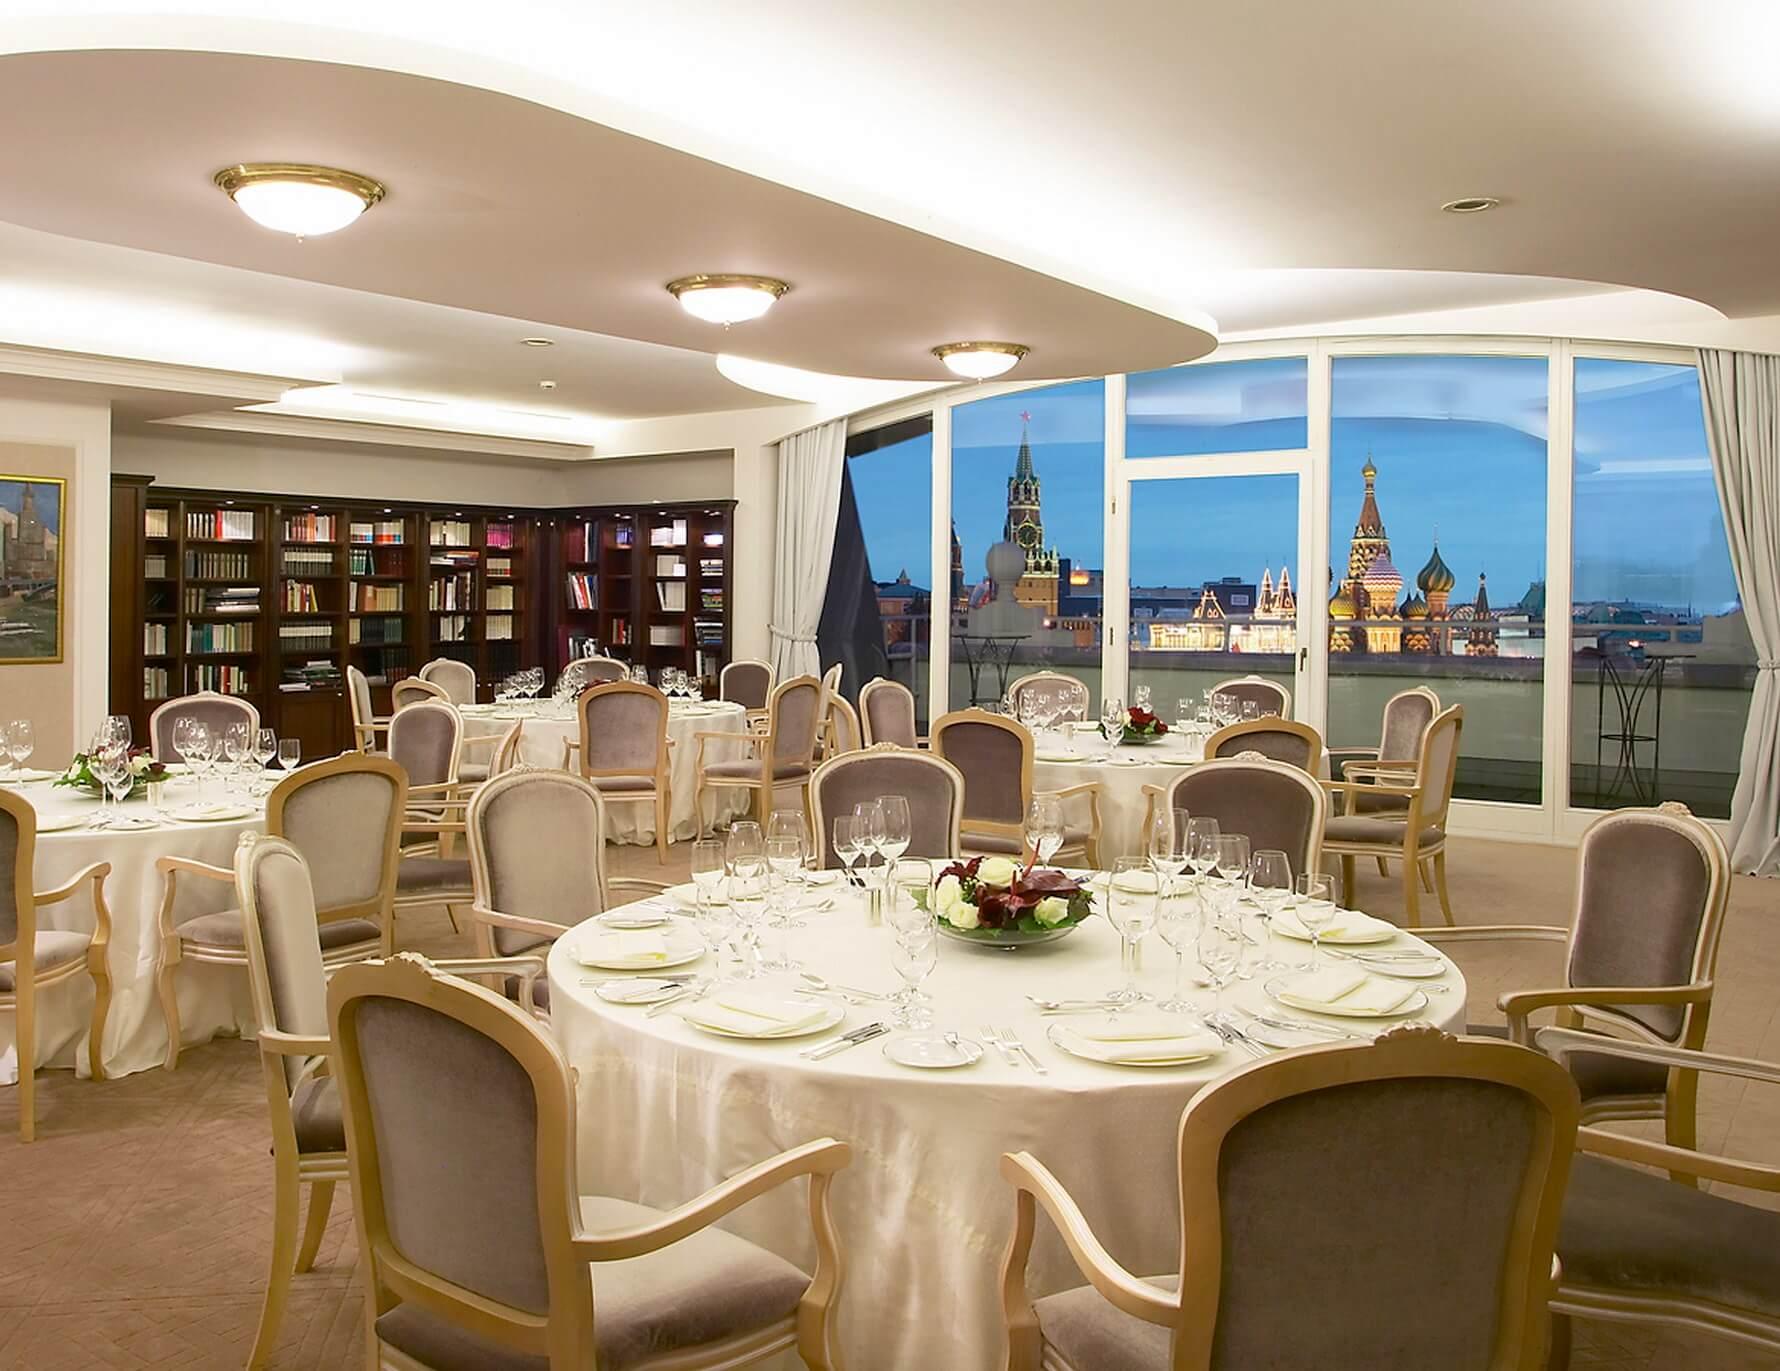 هتل بالتسشوگ کمپینسکی مسکو